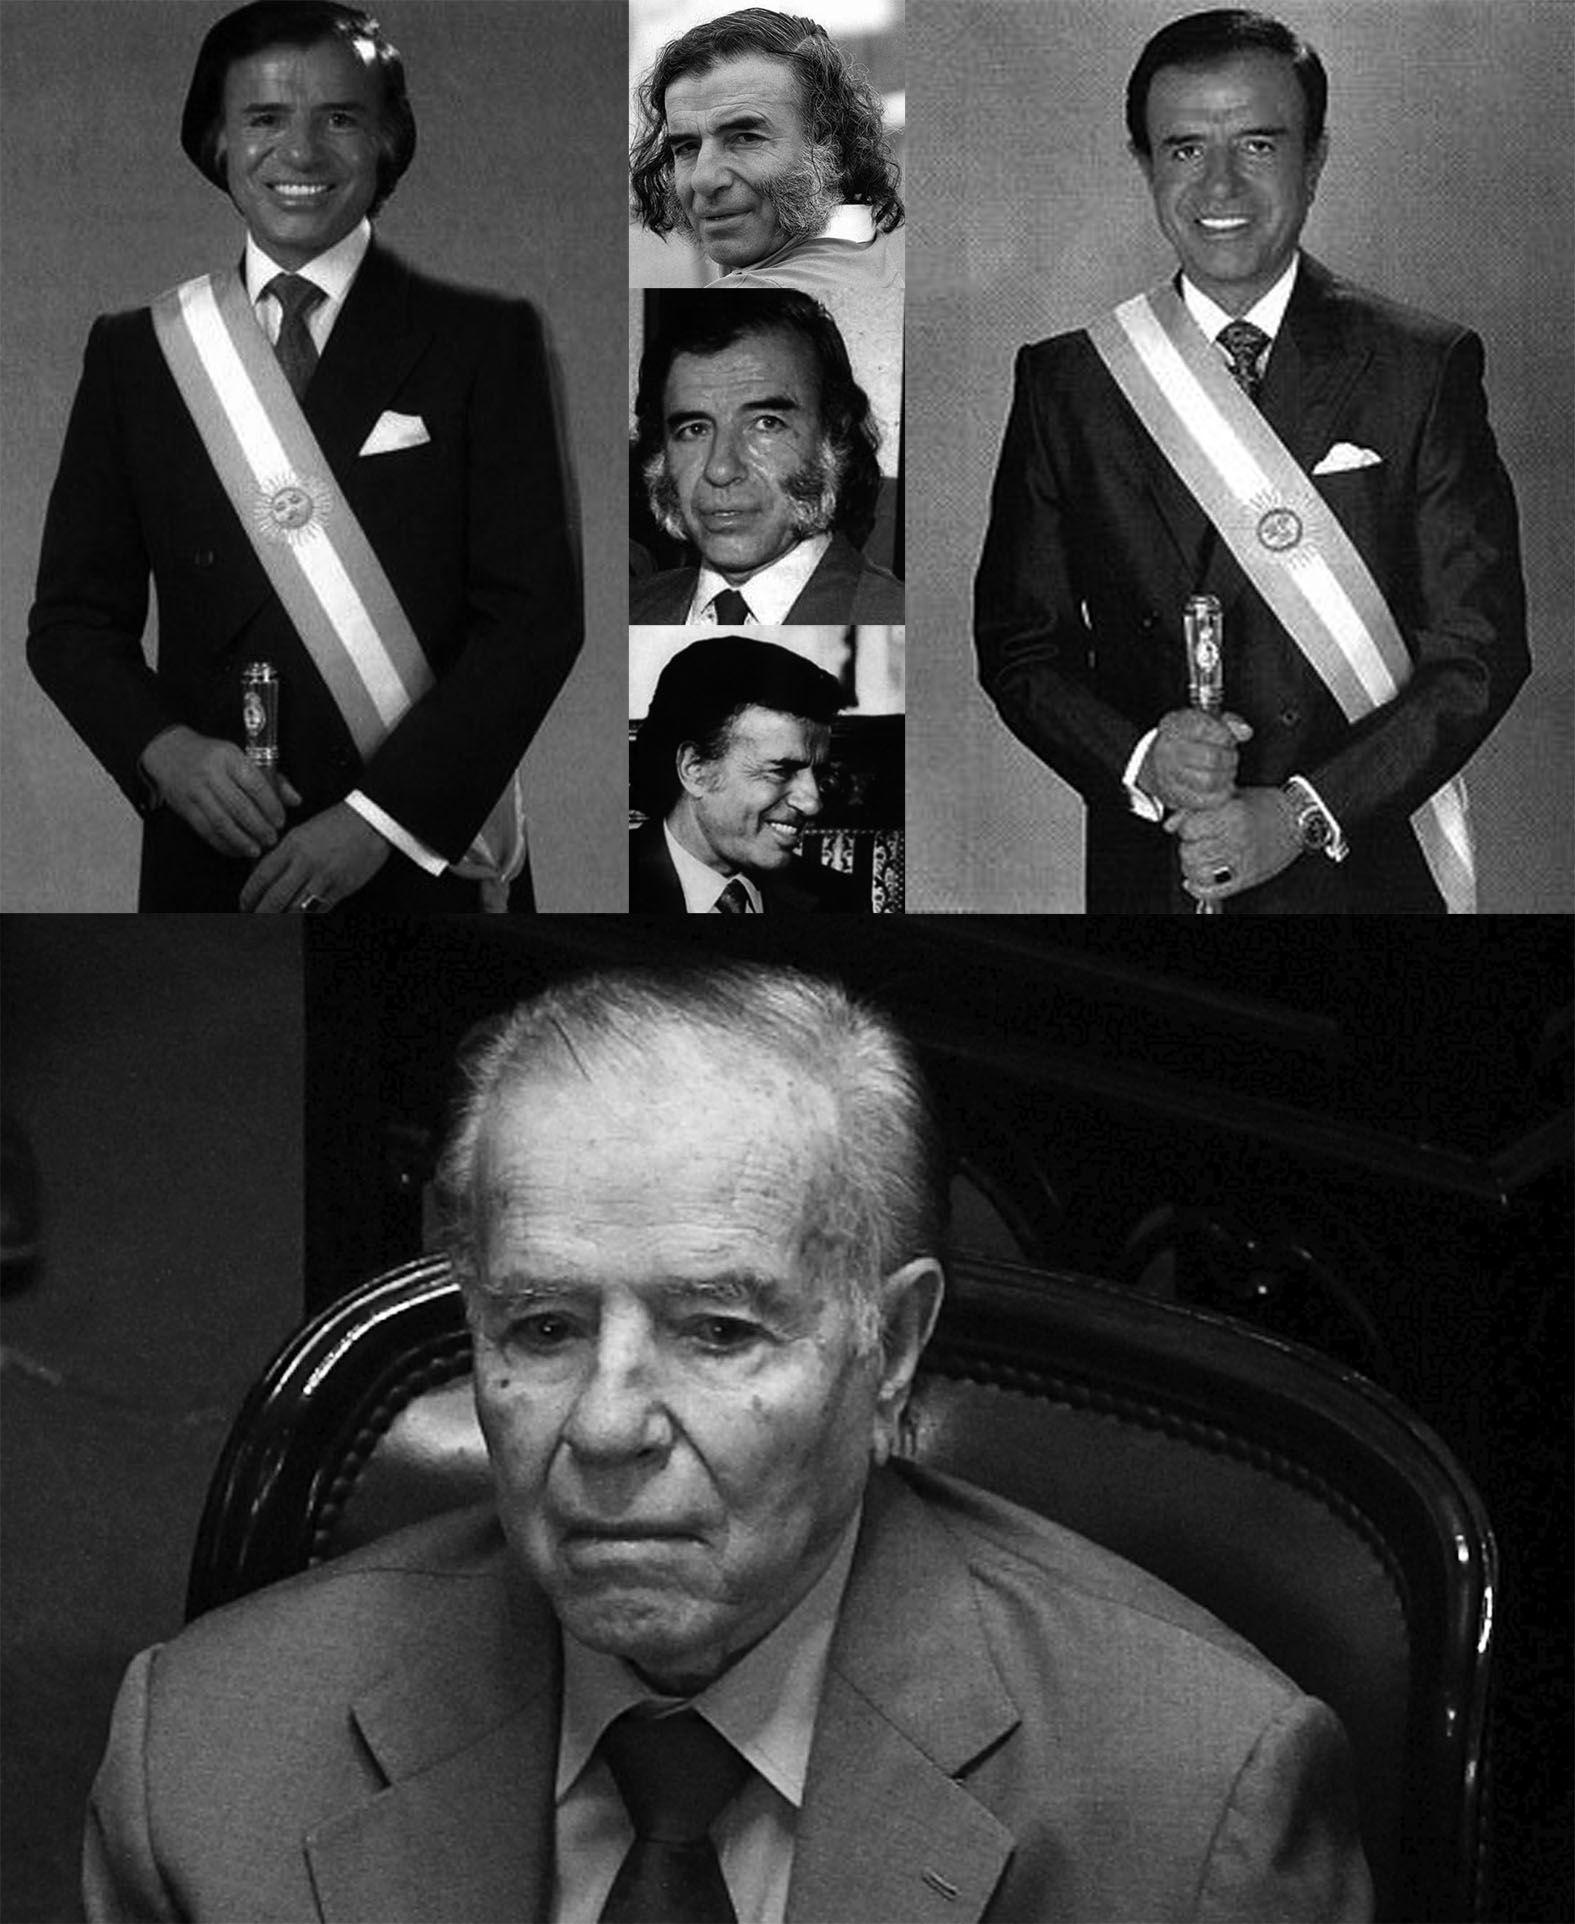 Menem se emocionó al recordar a un ex presidente